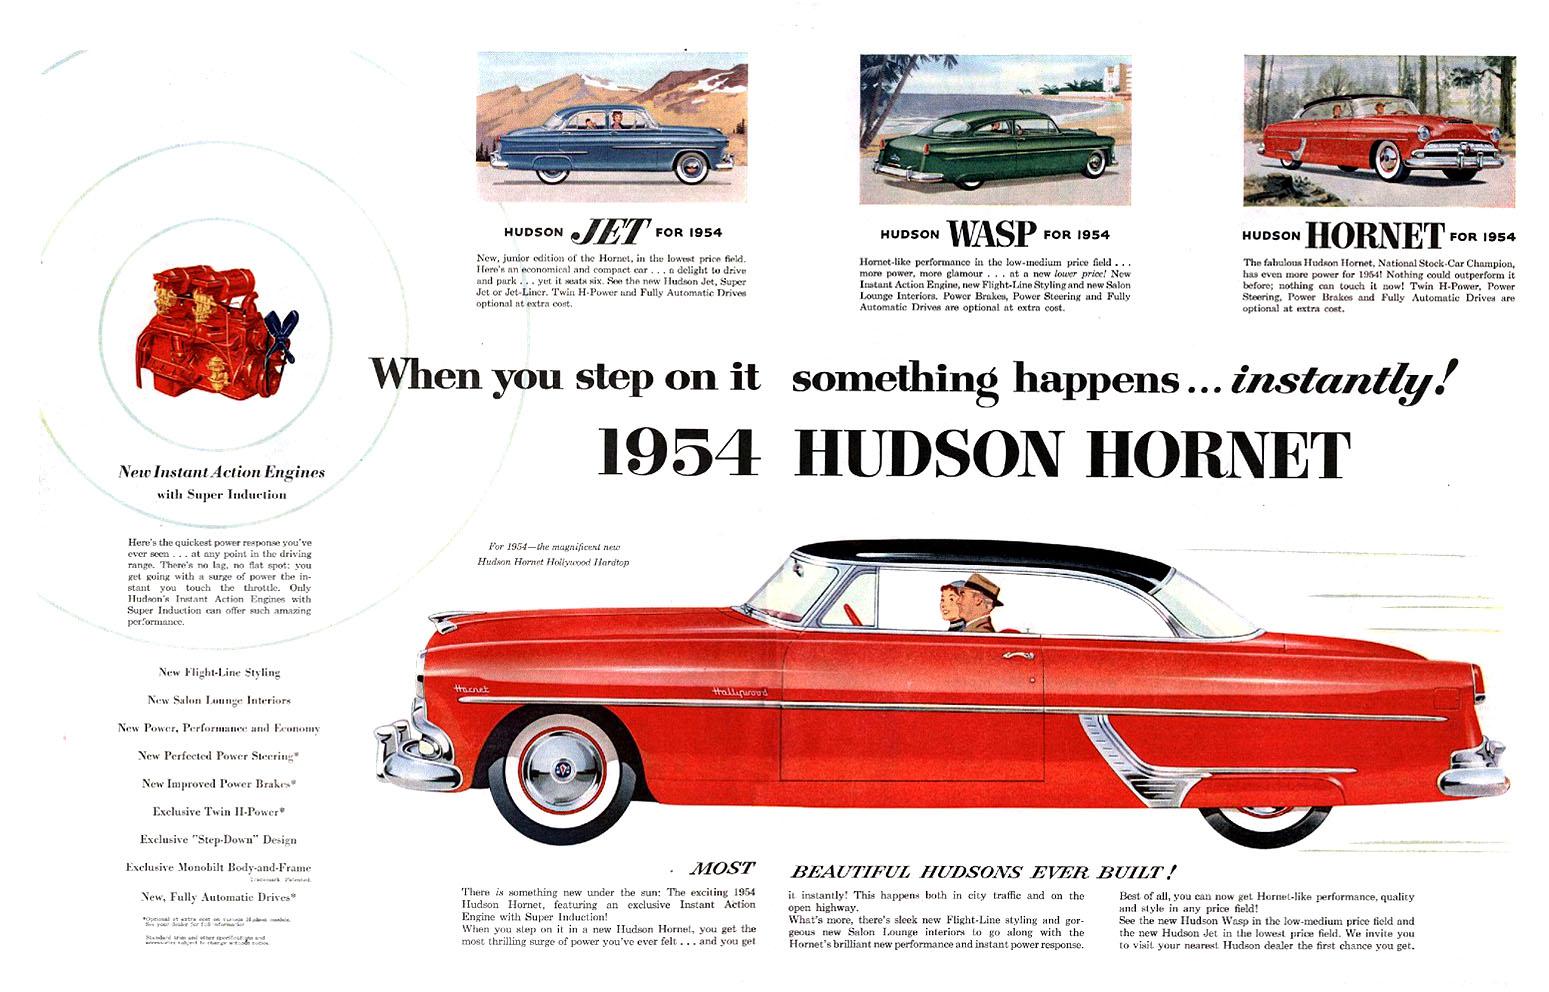 Hudson Engine Exchange moreover Hudson Engine Exchange further 1951 Plymouth 2 Door Suburban Wagon moreover Hudson Engine Exchange additionally 1953 Chrysler 2 Door Ghia. on 1951 hudson hornet wiring diagram